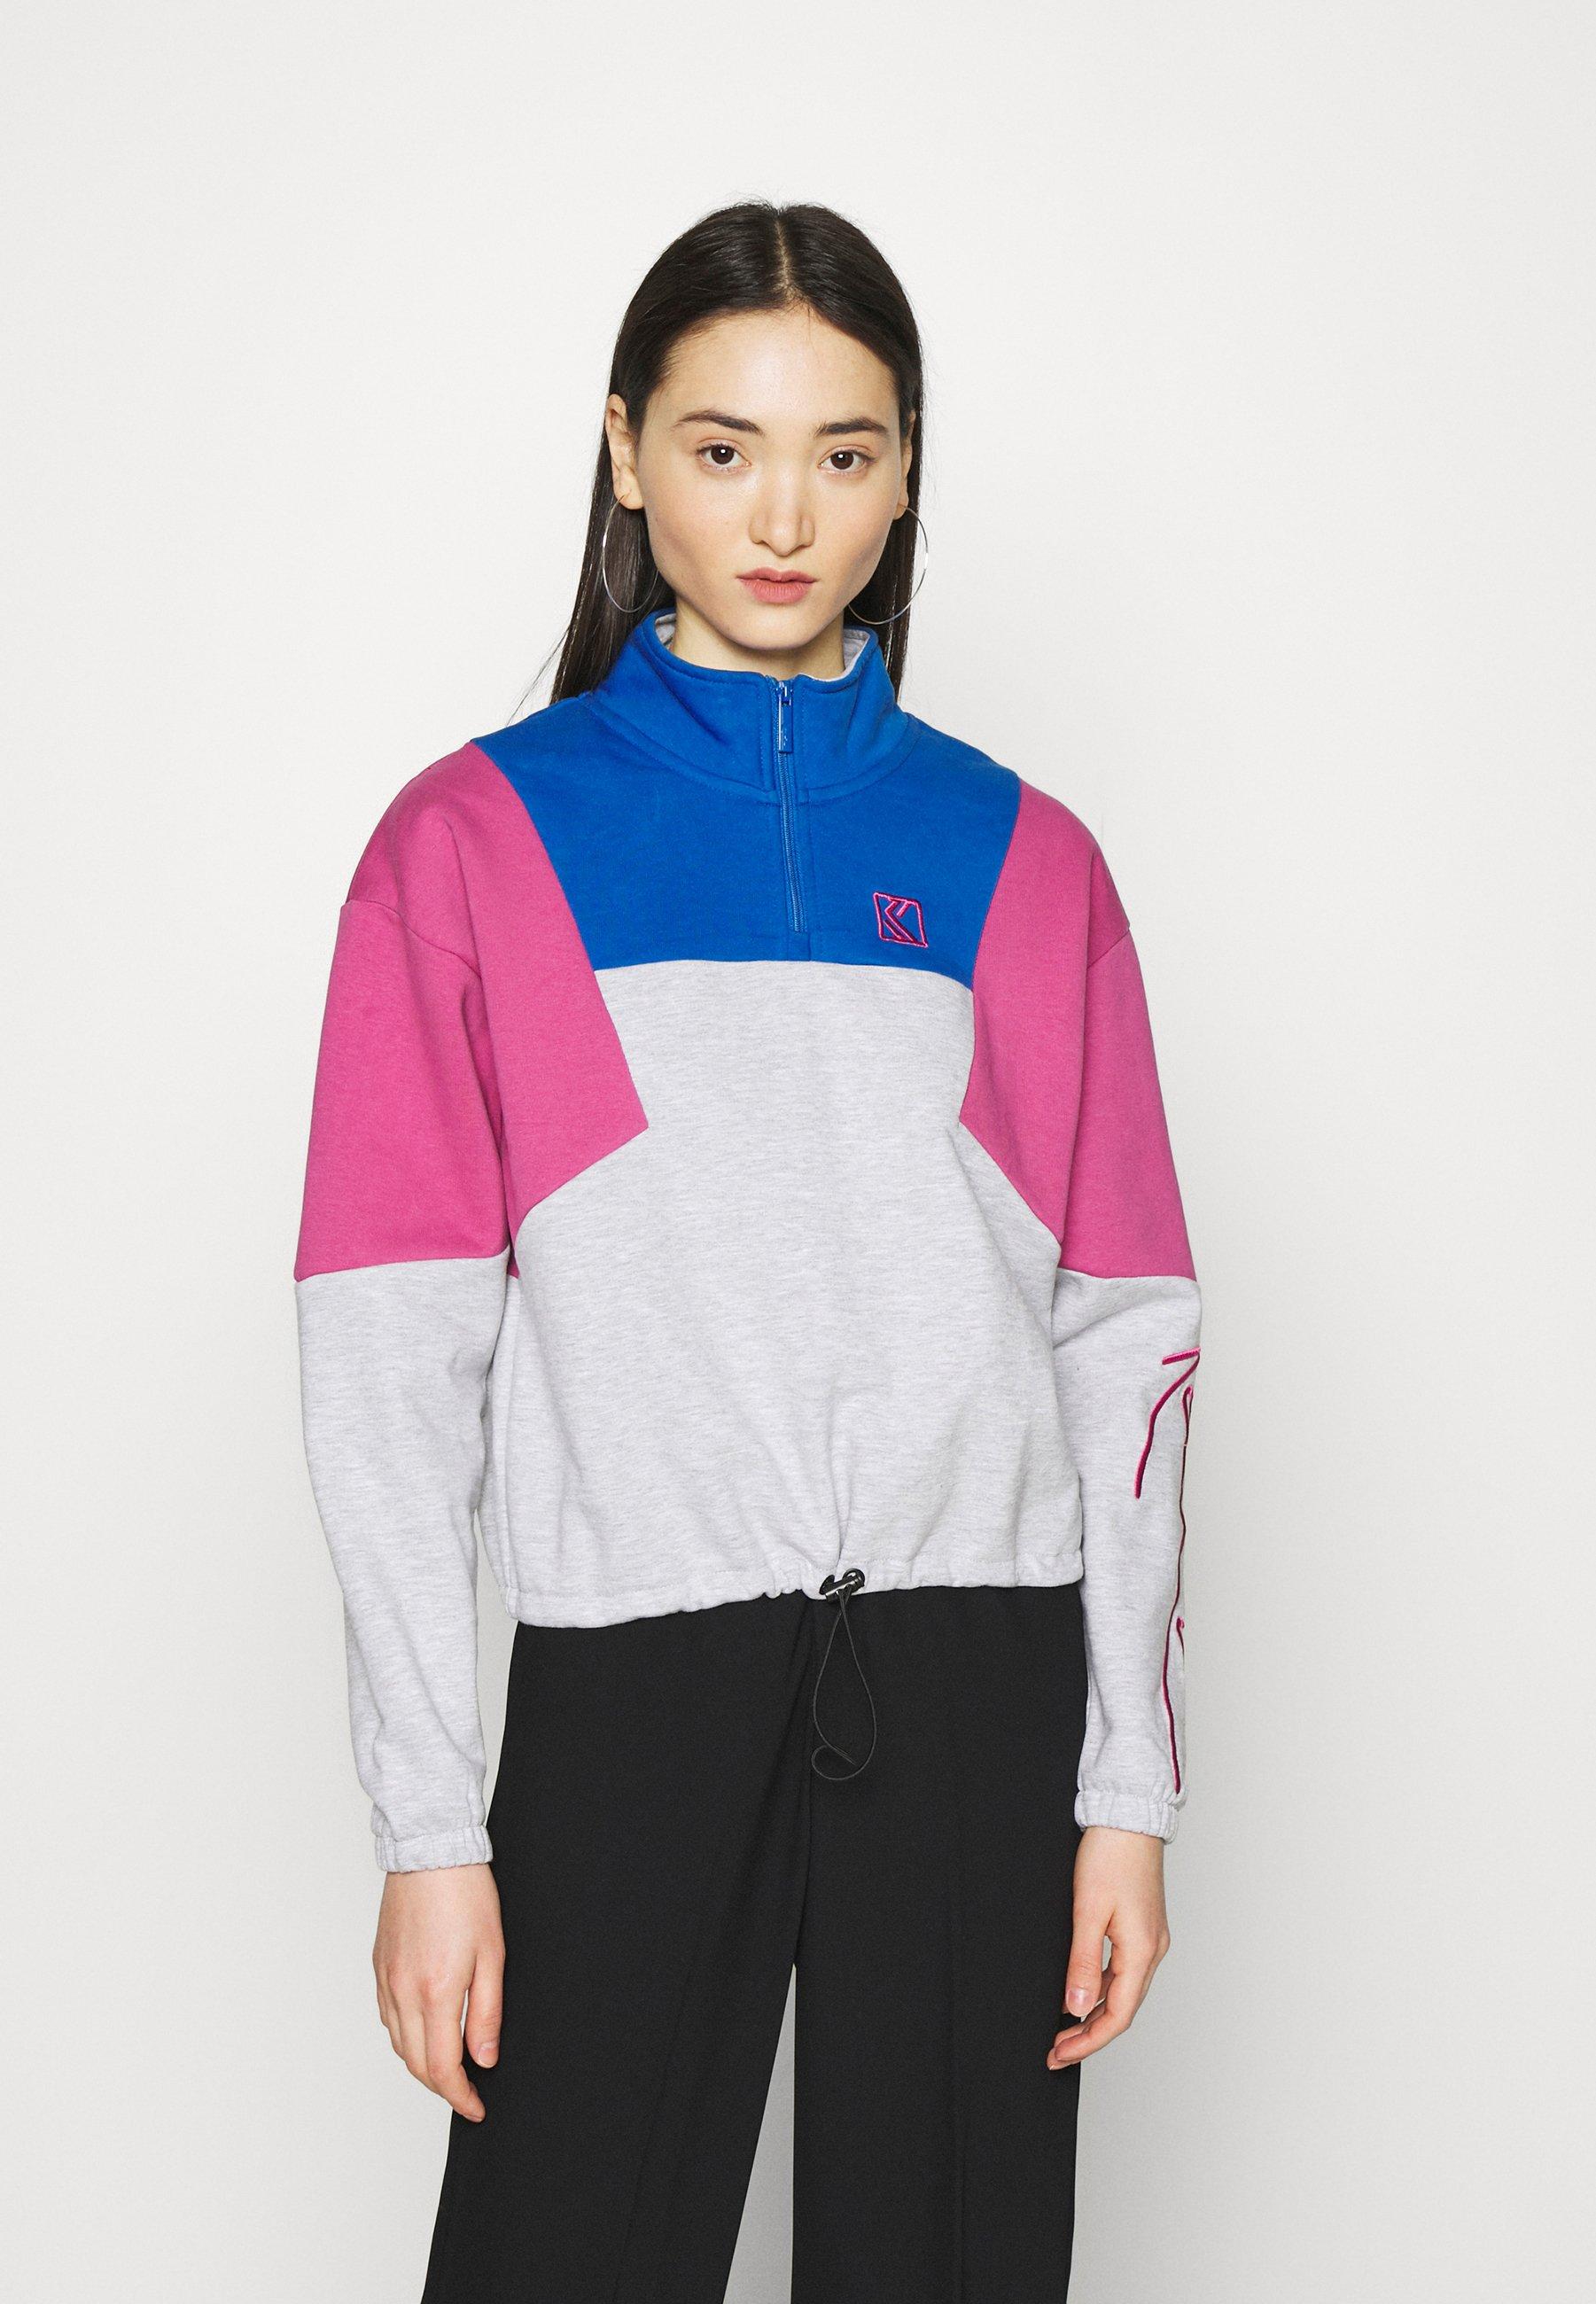 Femme SIGNATURE BLOCK TROYER - Sweatshirt